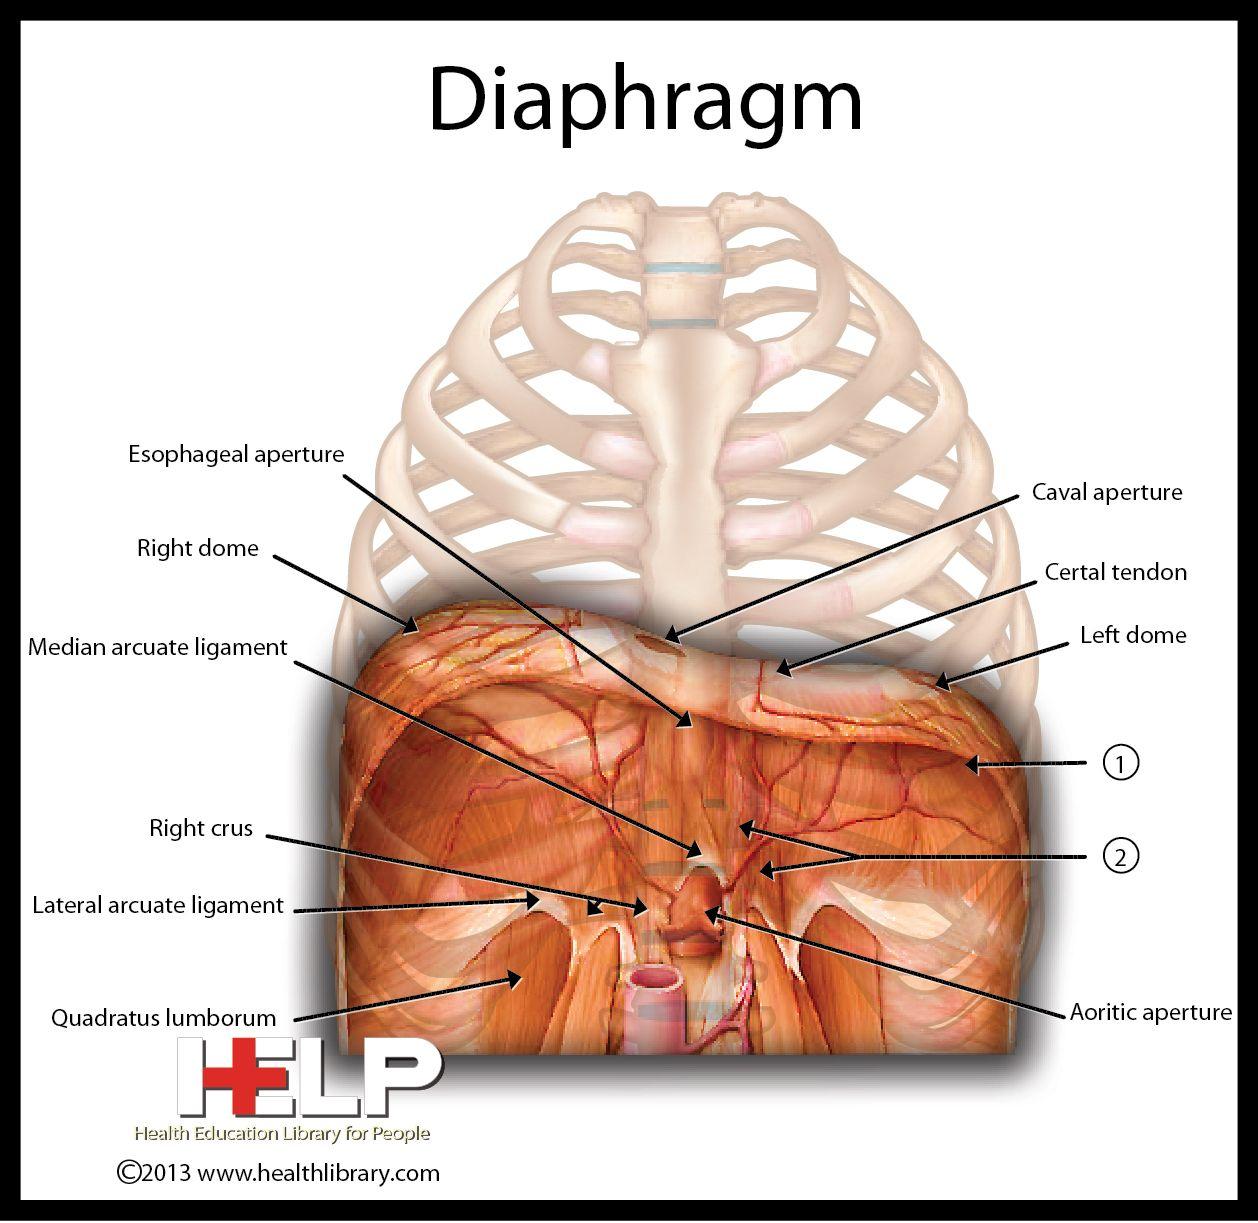 Diaphragm Respiratory System Pinterest Medical Anatomy And